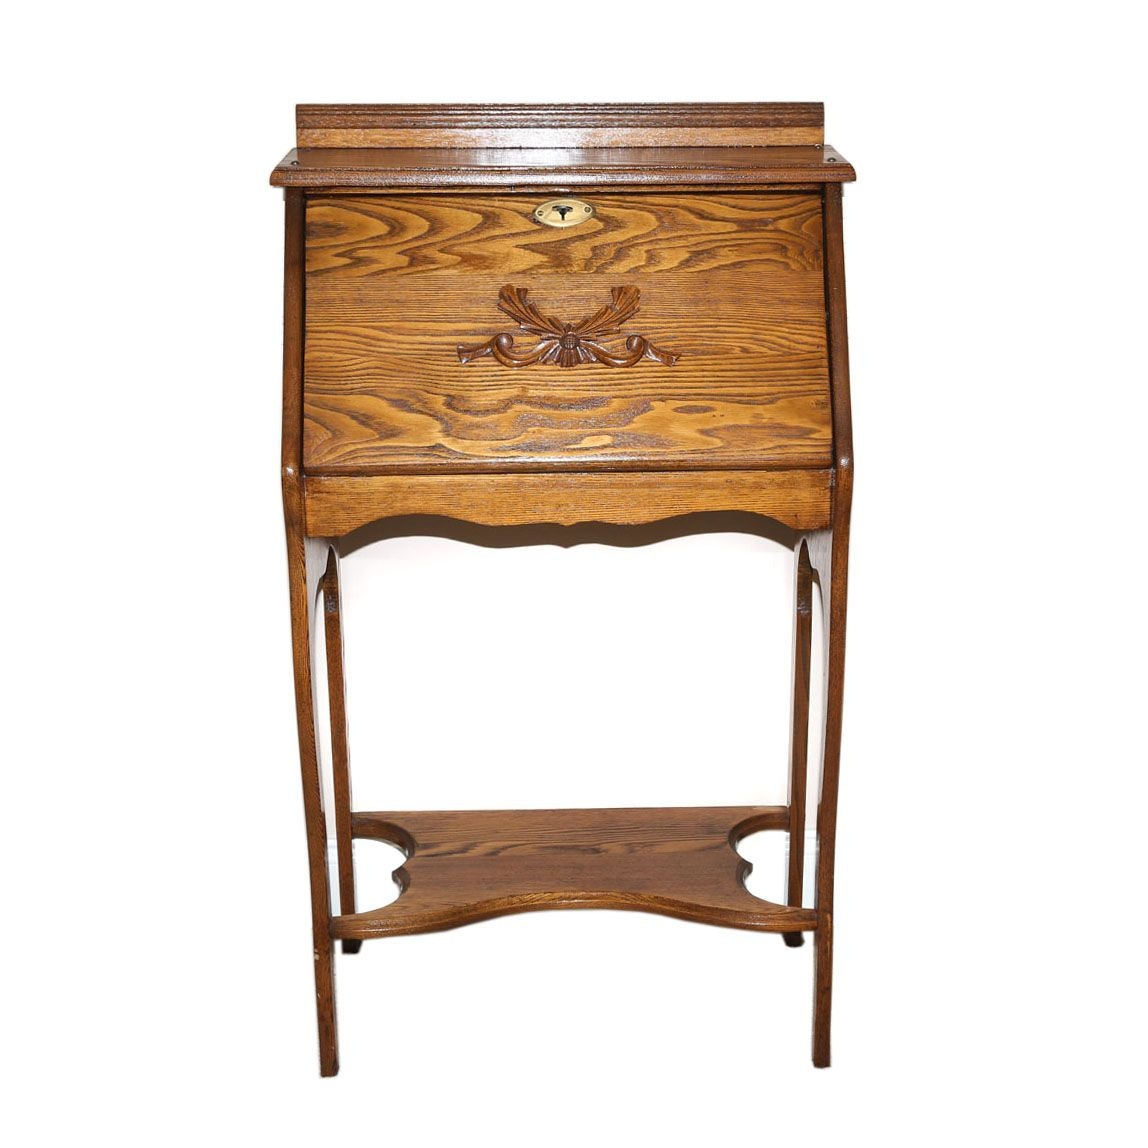 Oak Slant Top Ladies Writing Desk, 20th Century